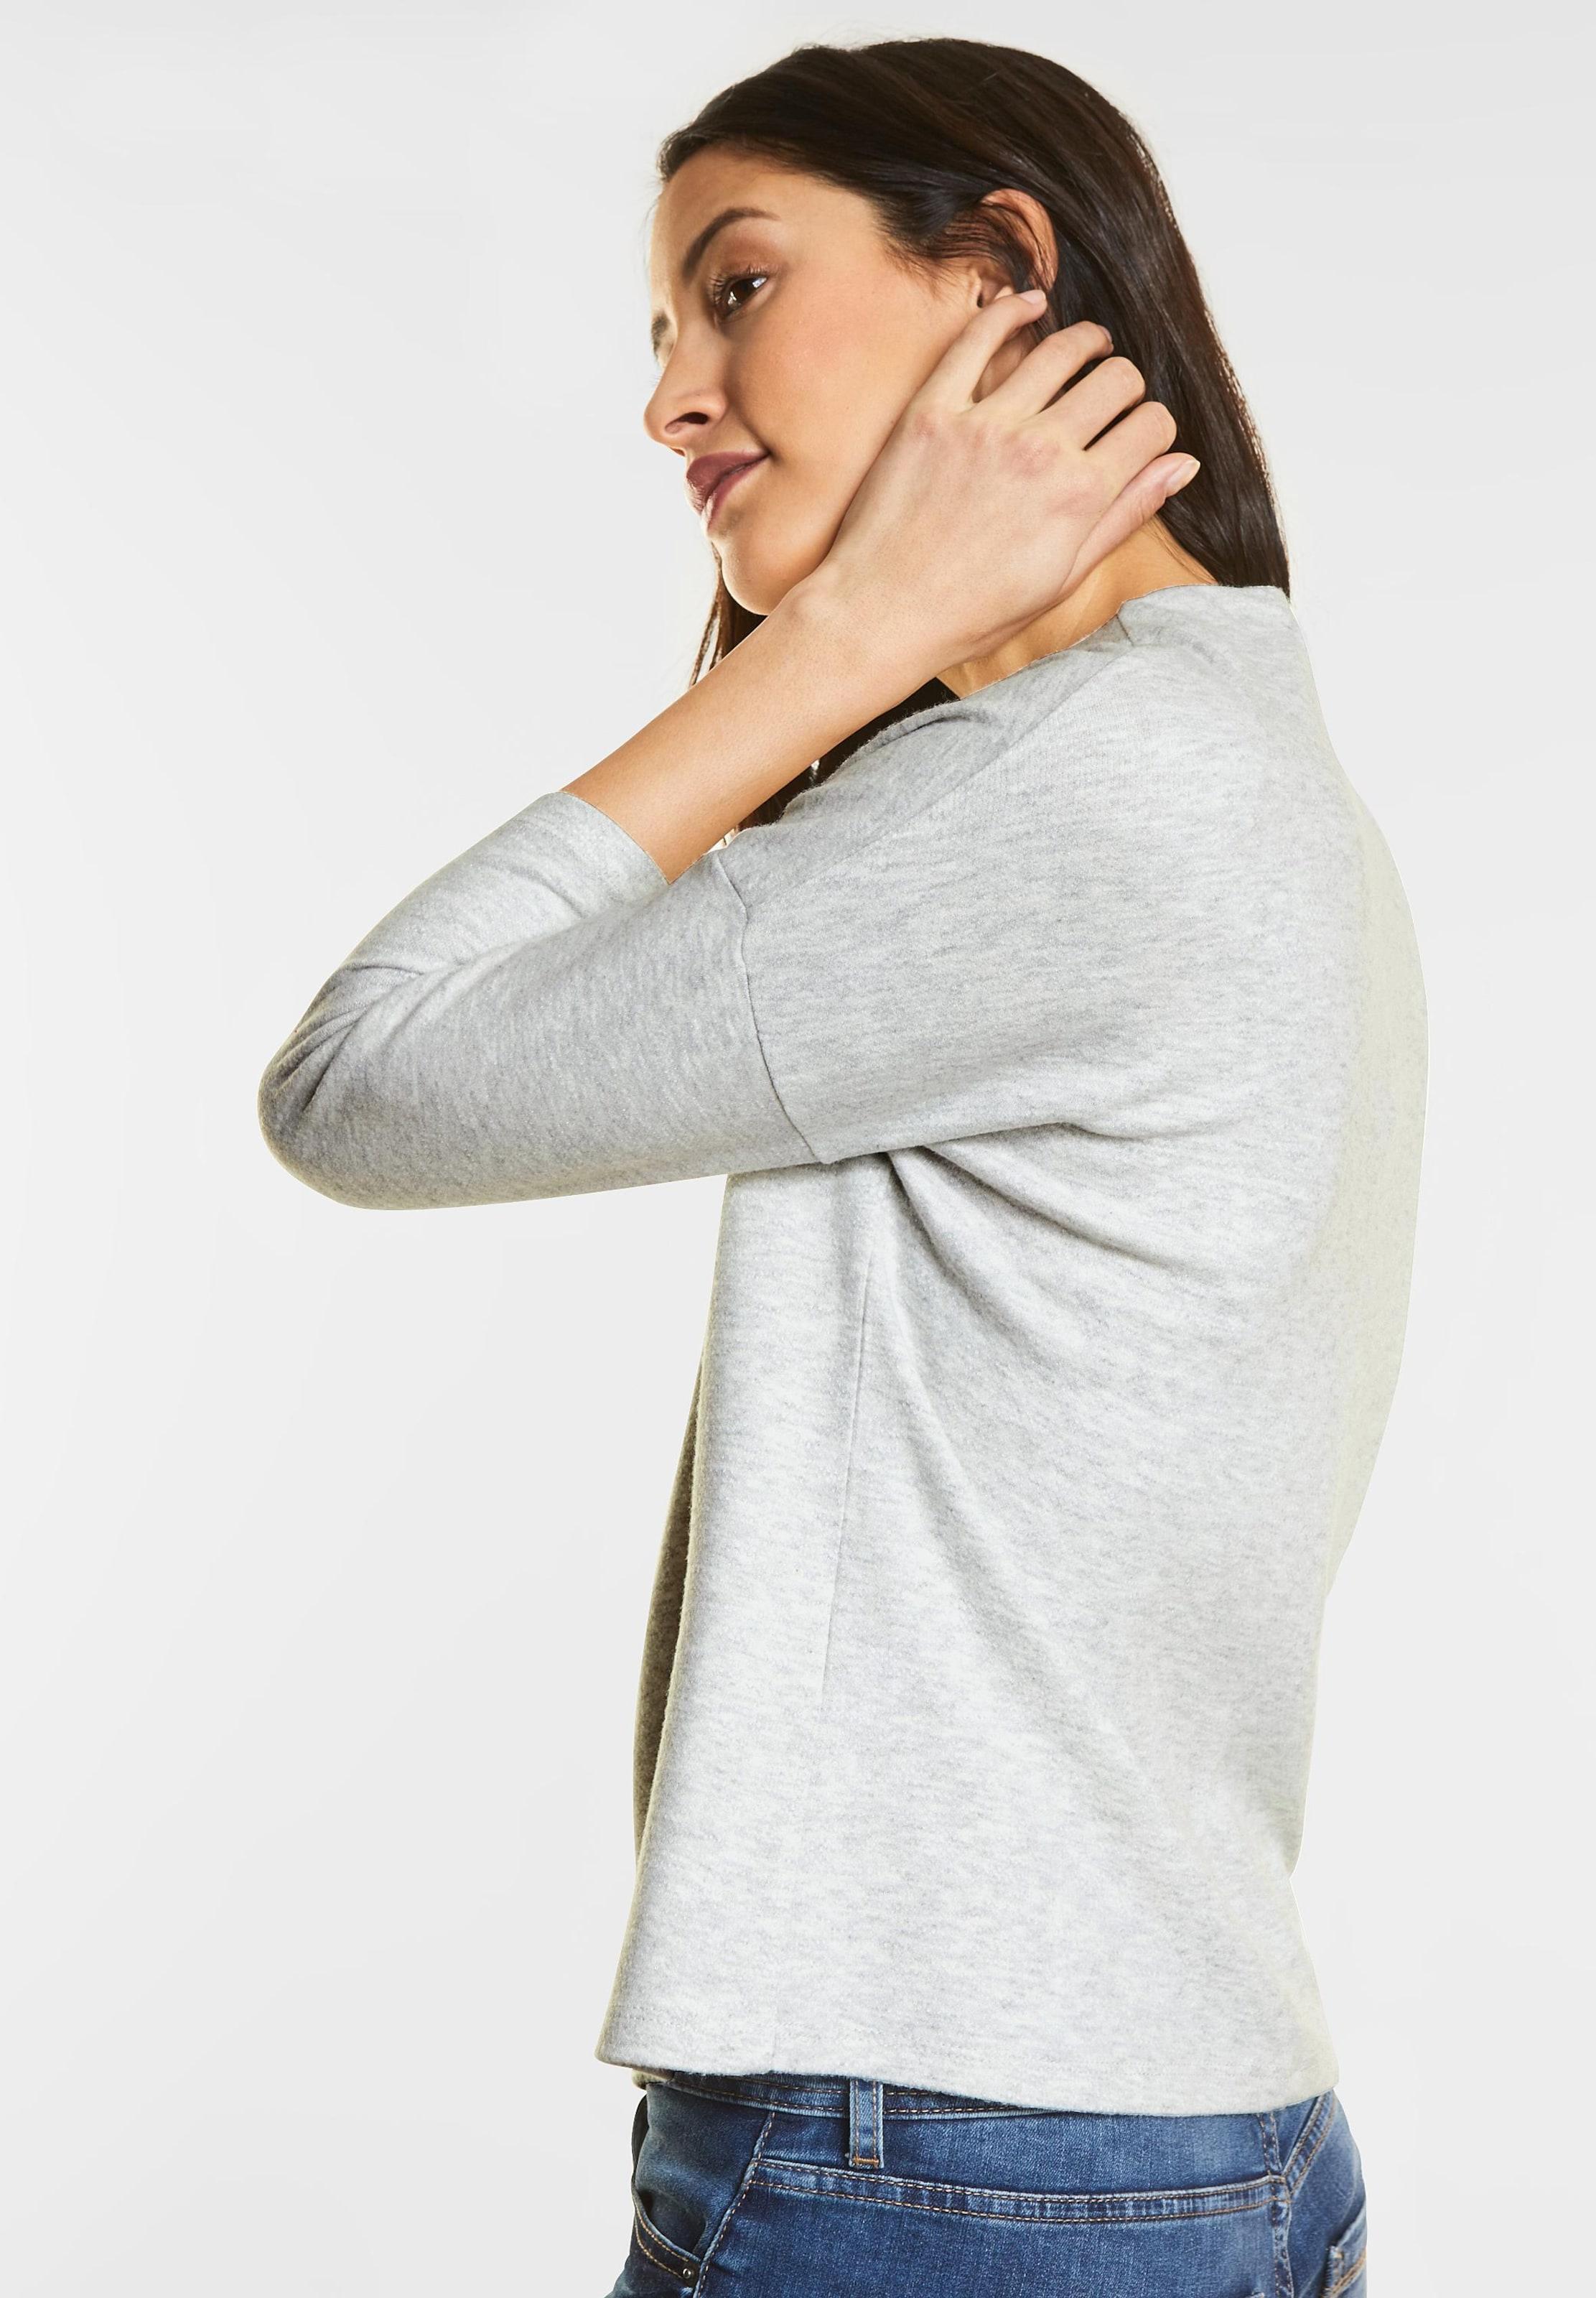 STREET ONE Softes Turtleneck Shirt Auslass Sehr Billig tnpKv